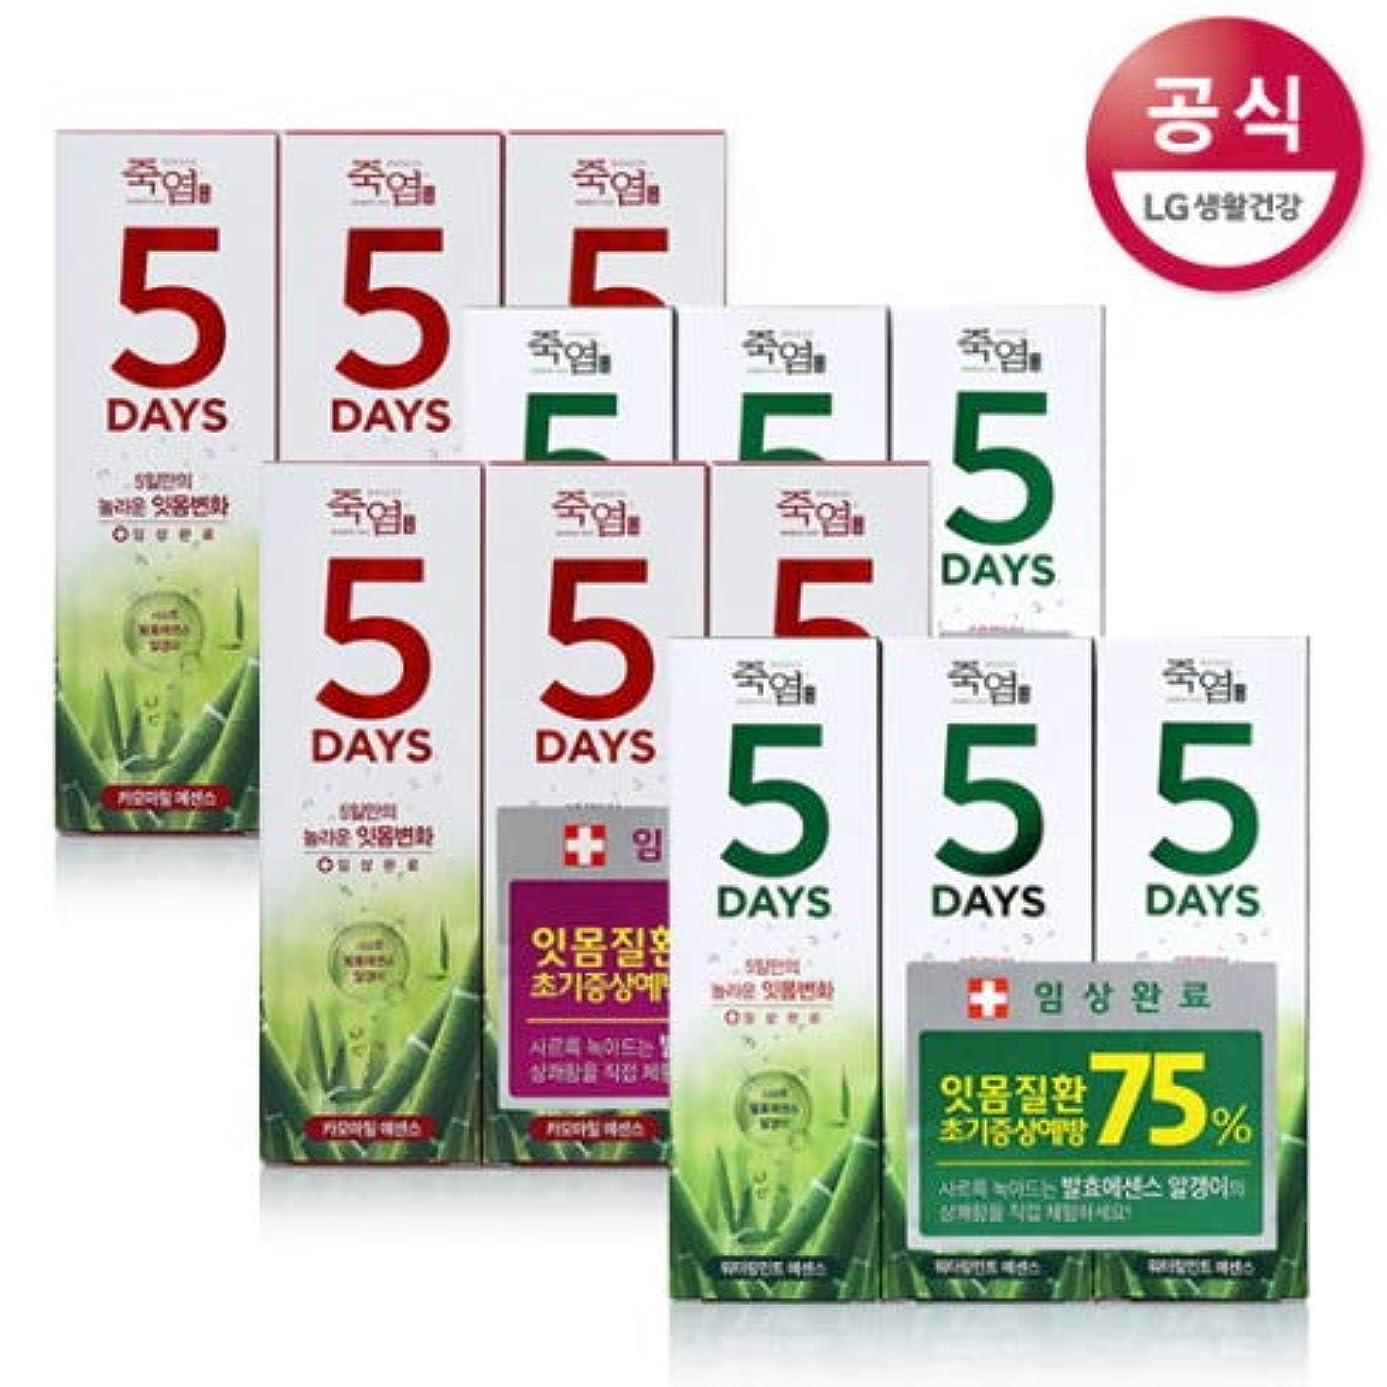 無限大幹バッグ[LG HnB] Bamboo Salt 5days Toothpaste /竹塩5days歯磨き粉 100gx12個(海外直送品)